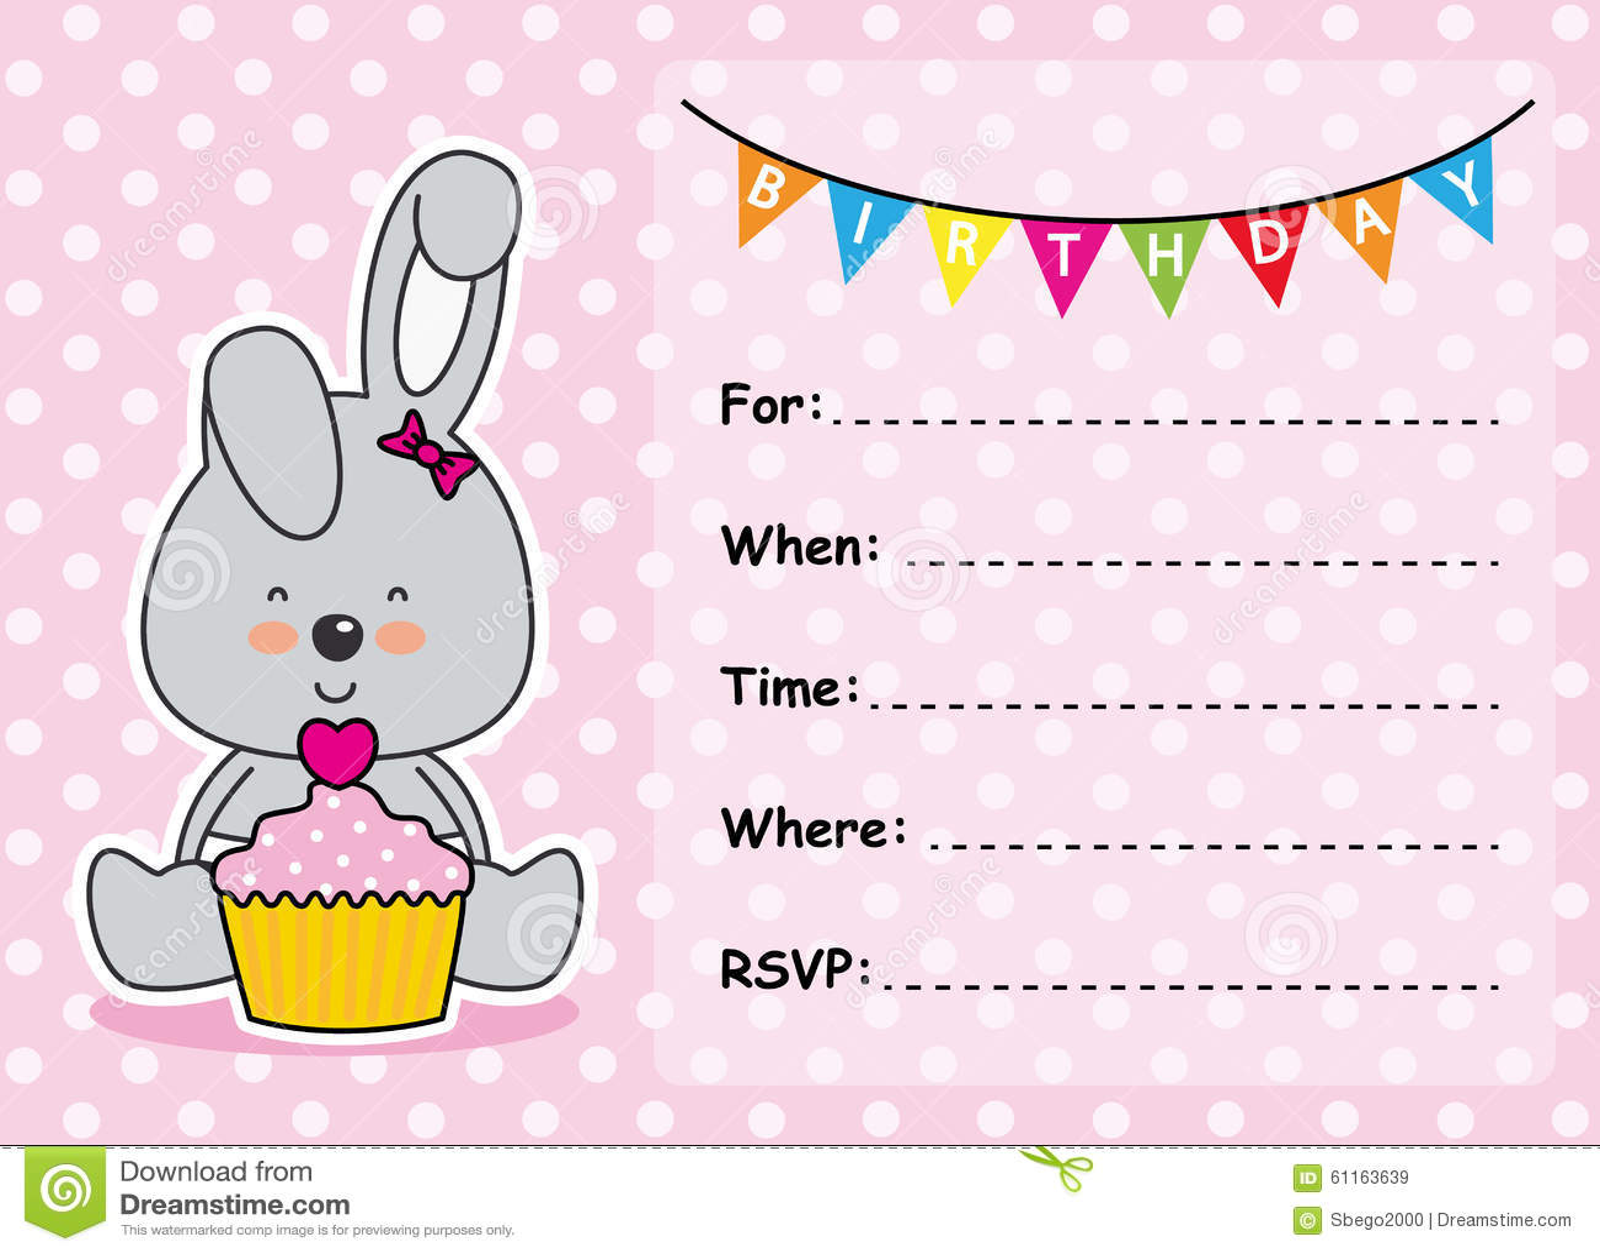 Invitation Card Birthday Girl Stock Vector - Illustration of space, text: 61163639